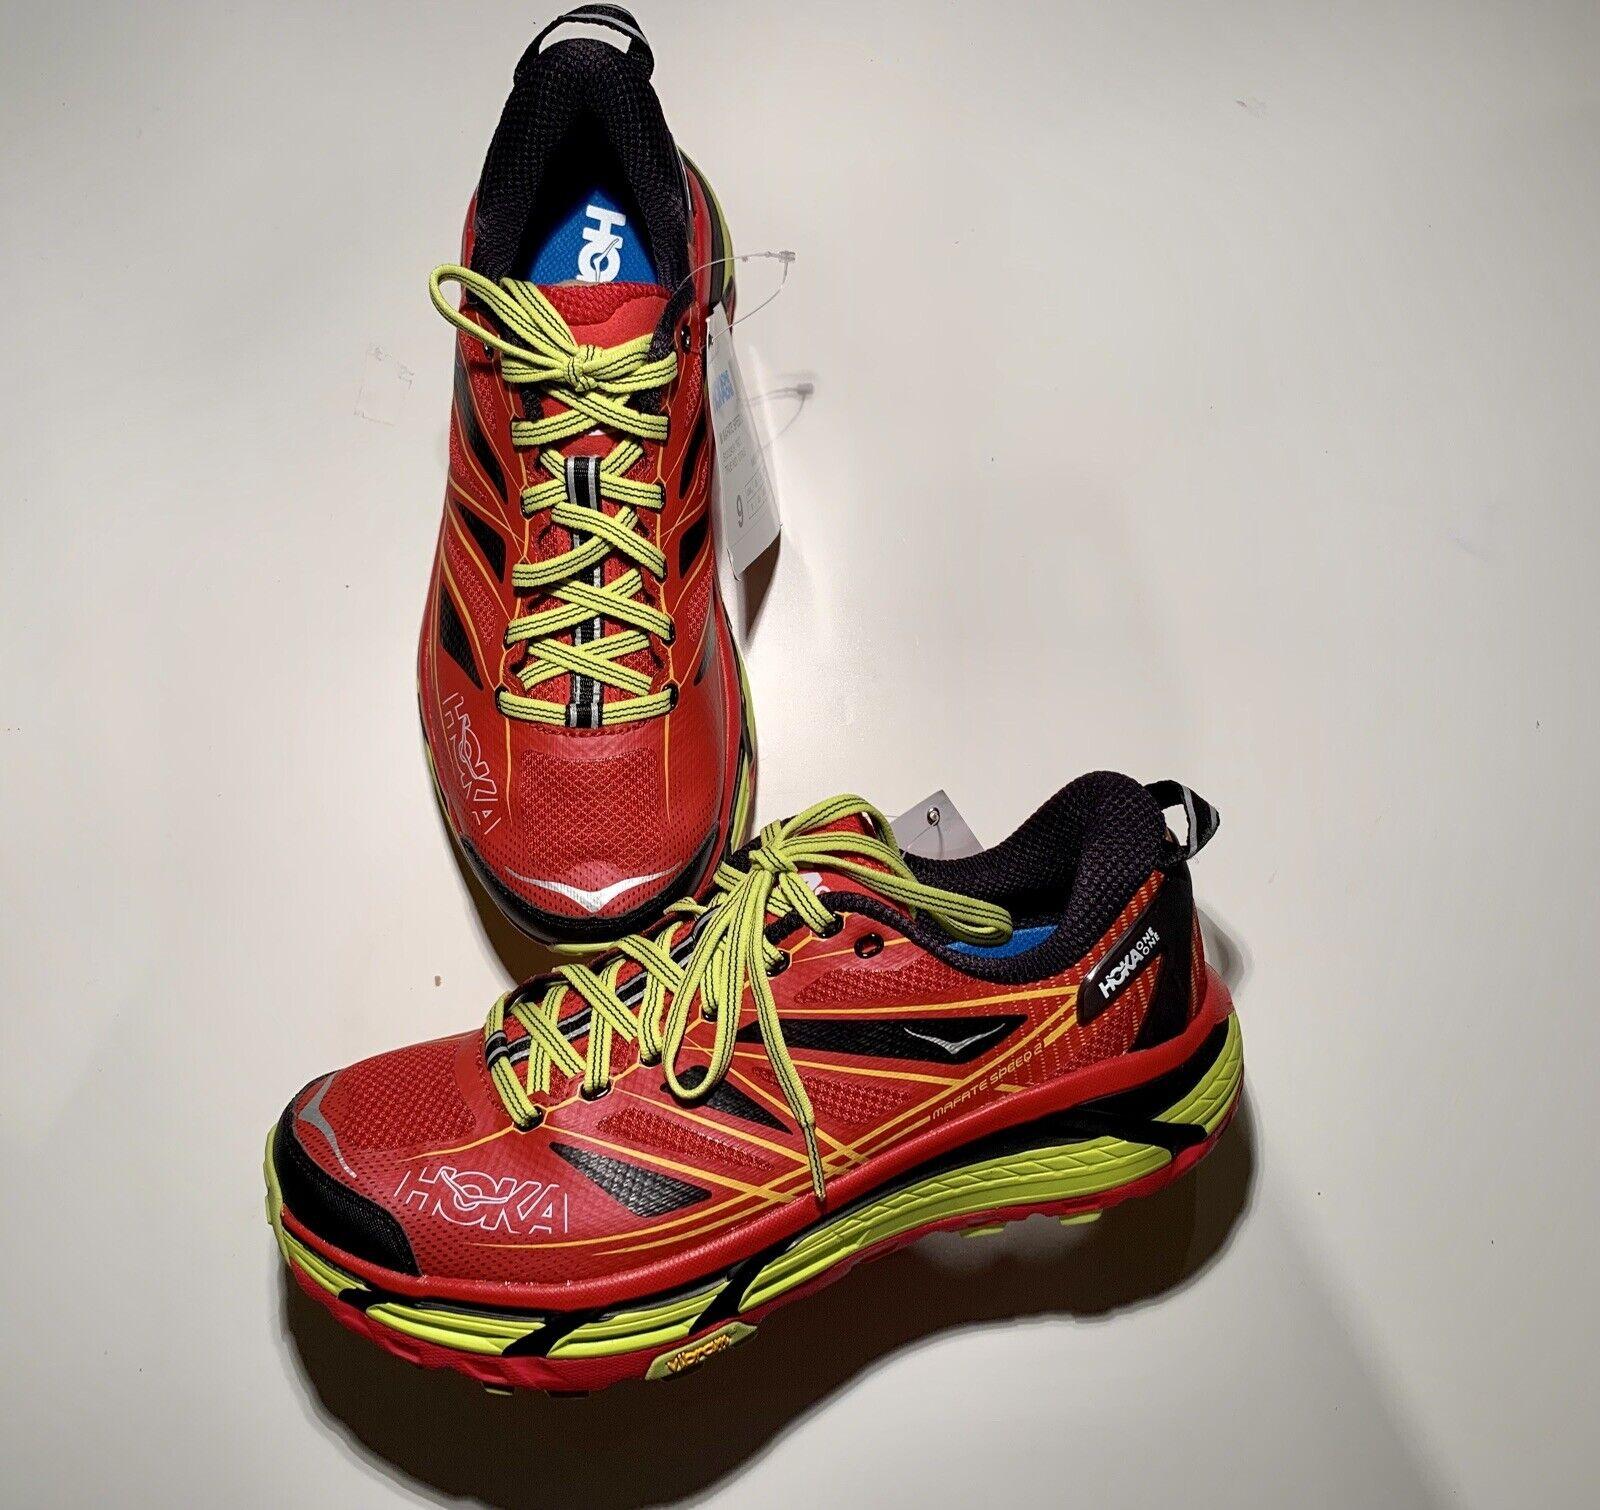 Hoka One One Men's Mafate Speed 2 Running shoes True Red Citrus Size 9M BA